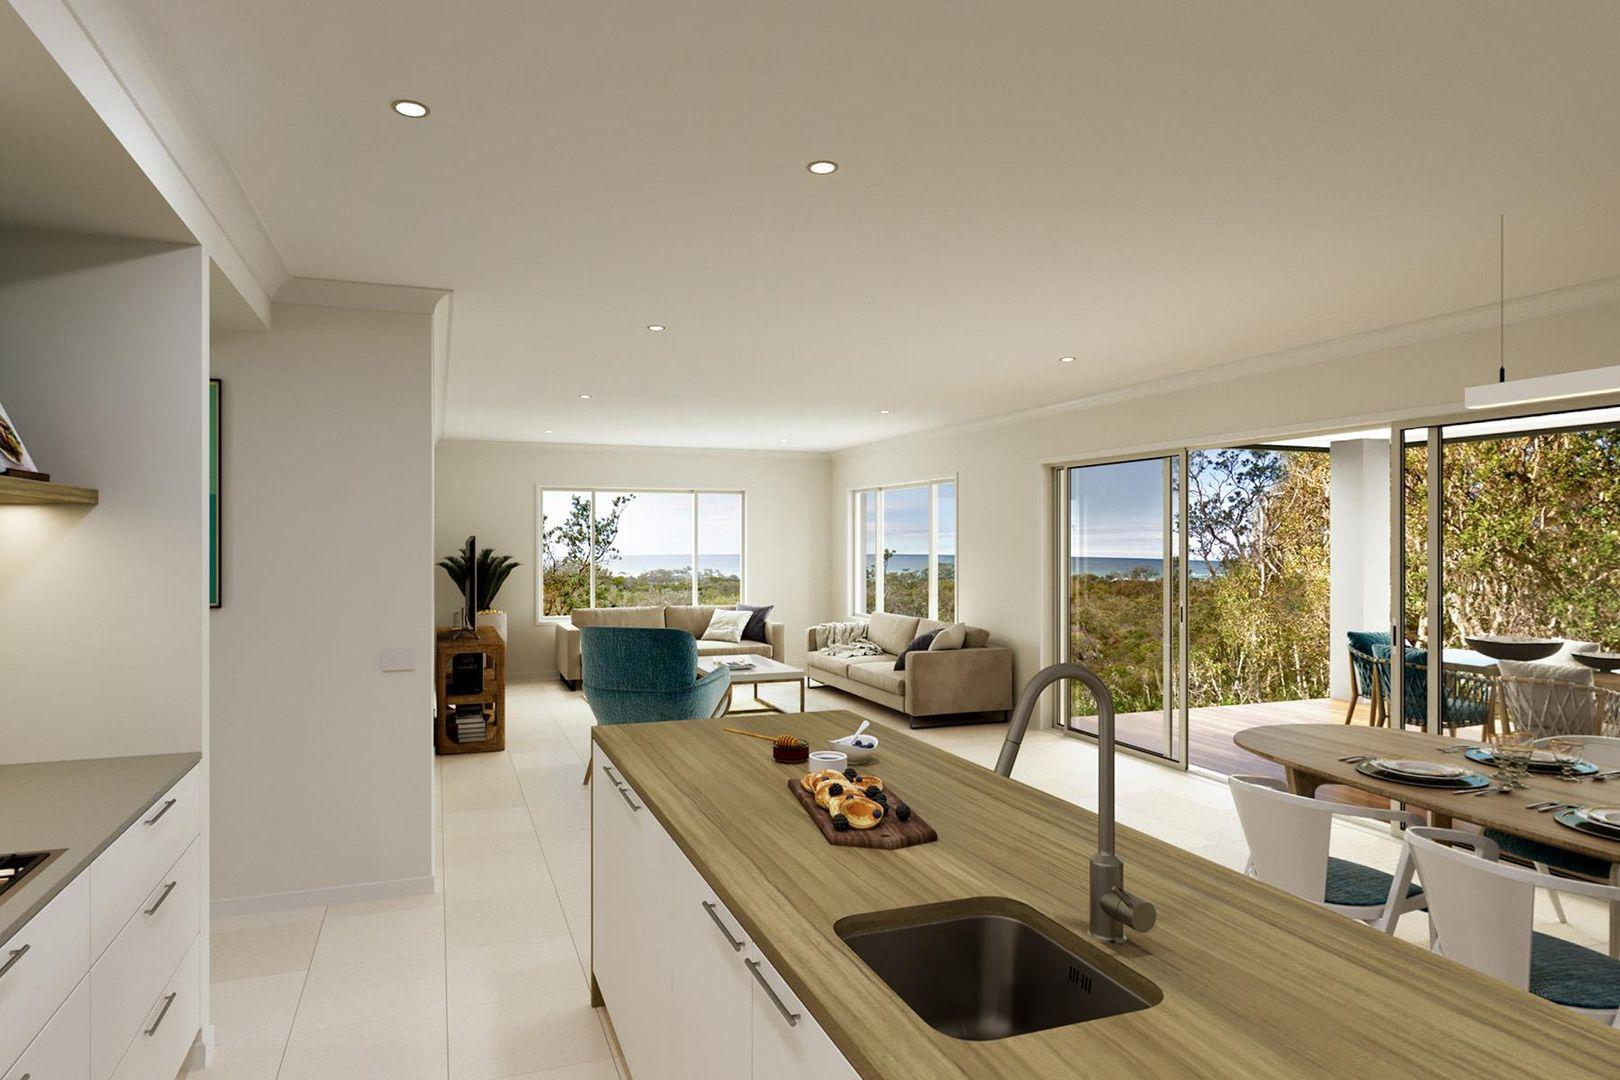 Lot 31 Harness Rd, Pinnacle Views, Kelso QLD 4815, Image 0